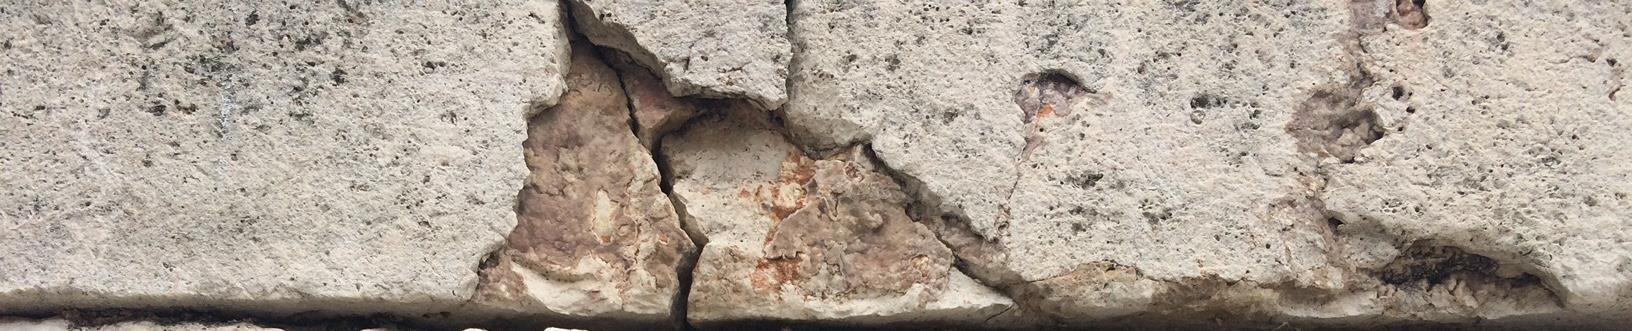 NewPro Anti Erosion NC